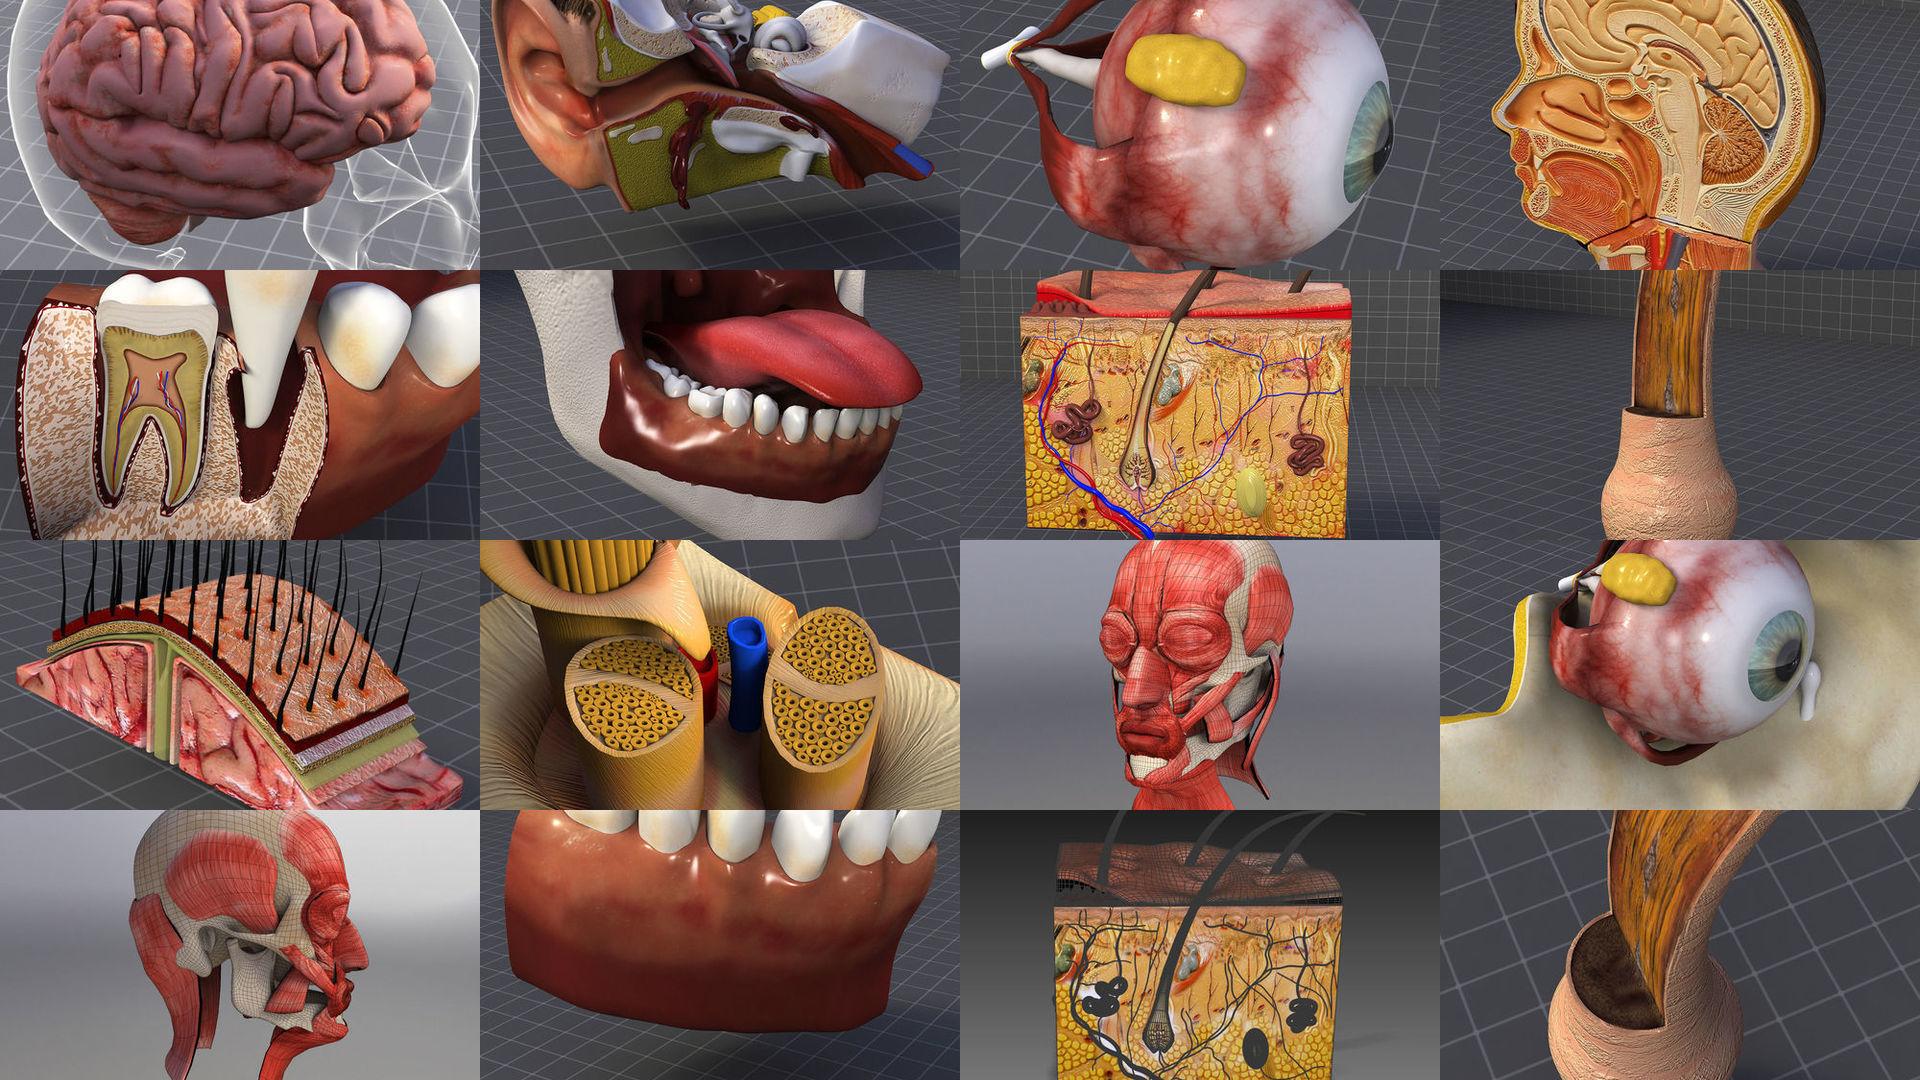 Cephalic Anatomy Collection - Head